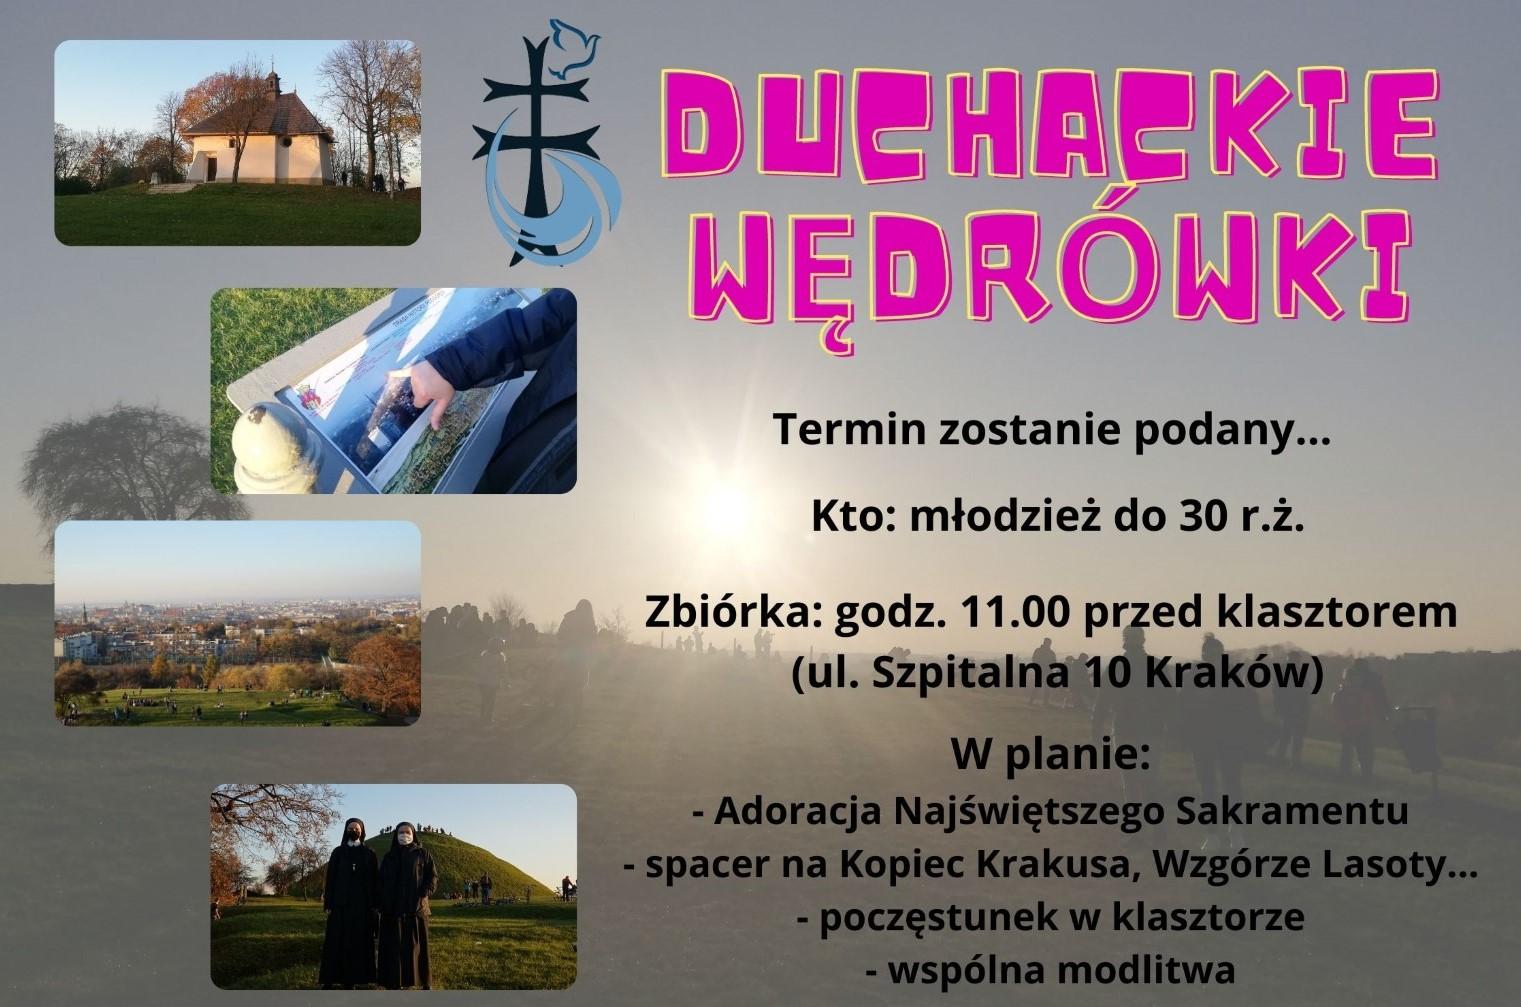 duchackie_wedrowki_plakat